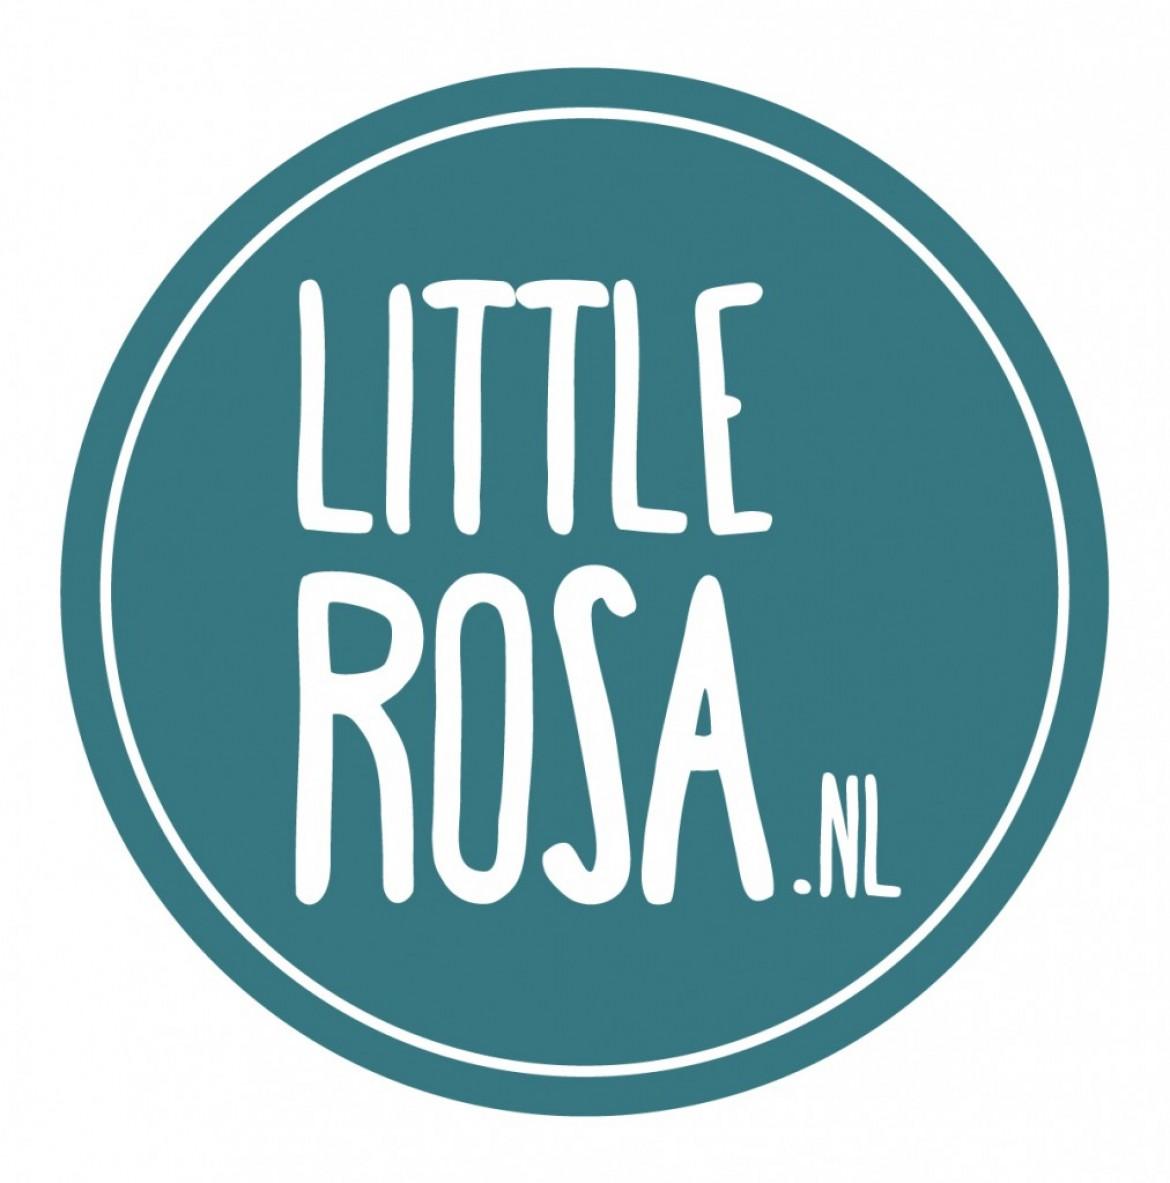 Little Rosa